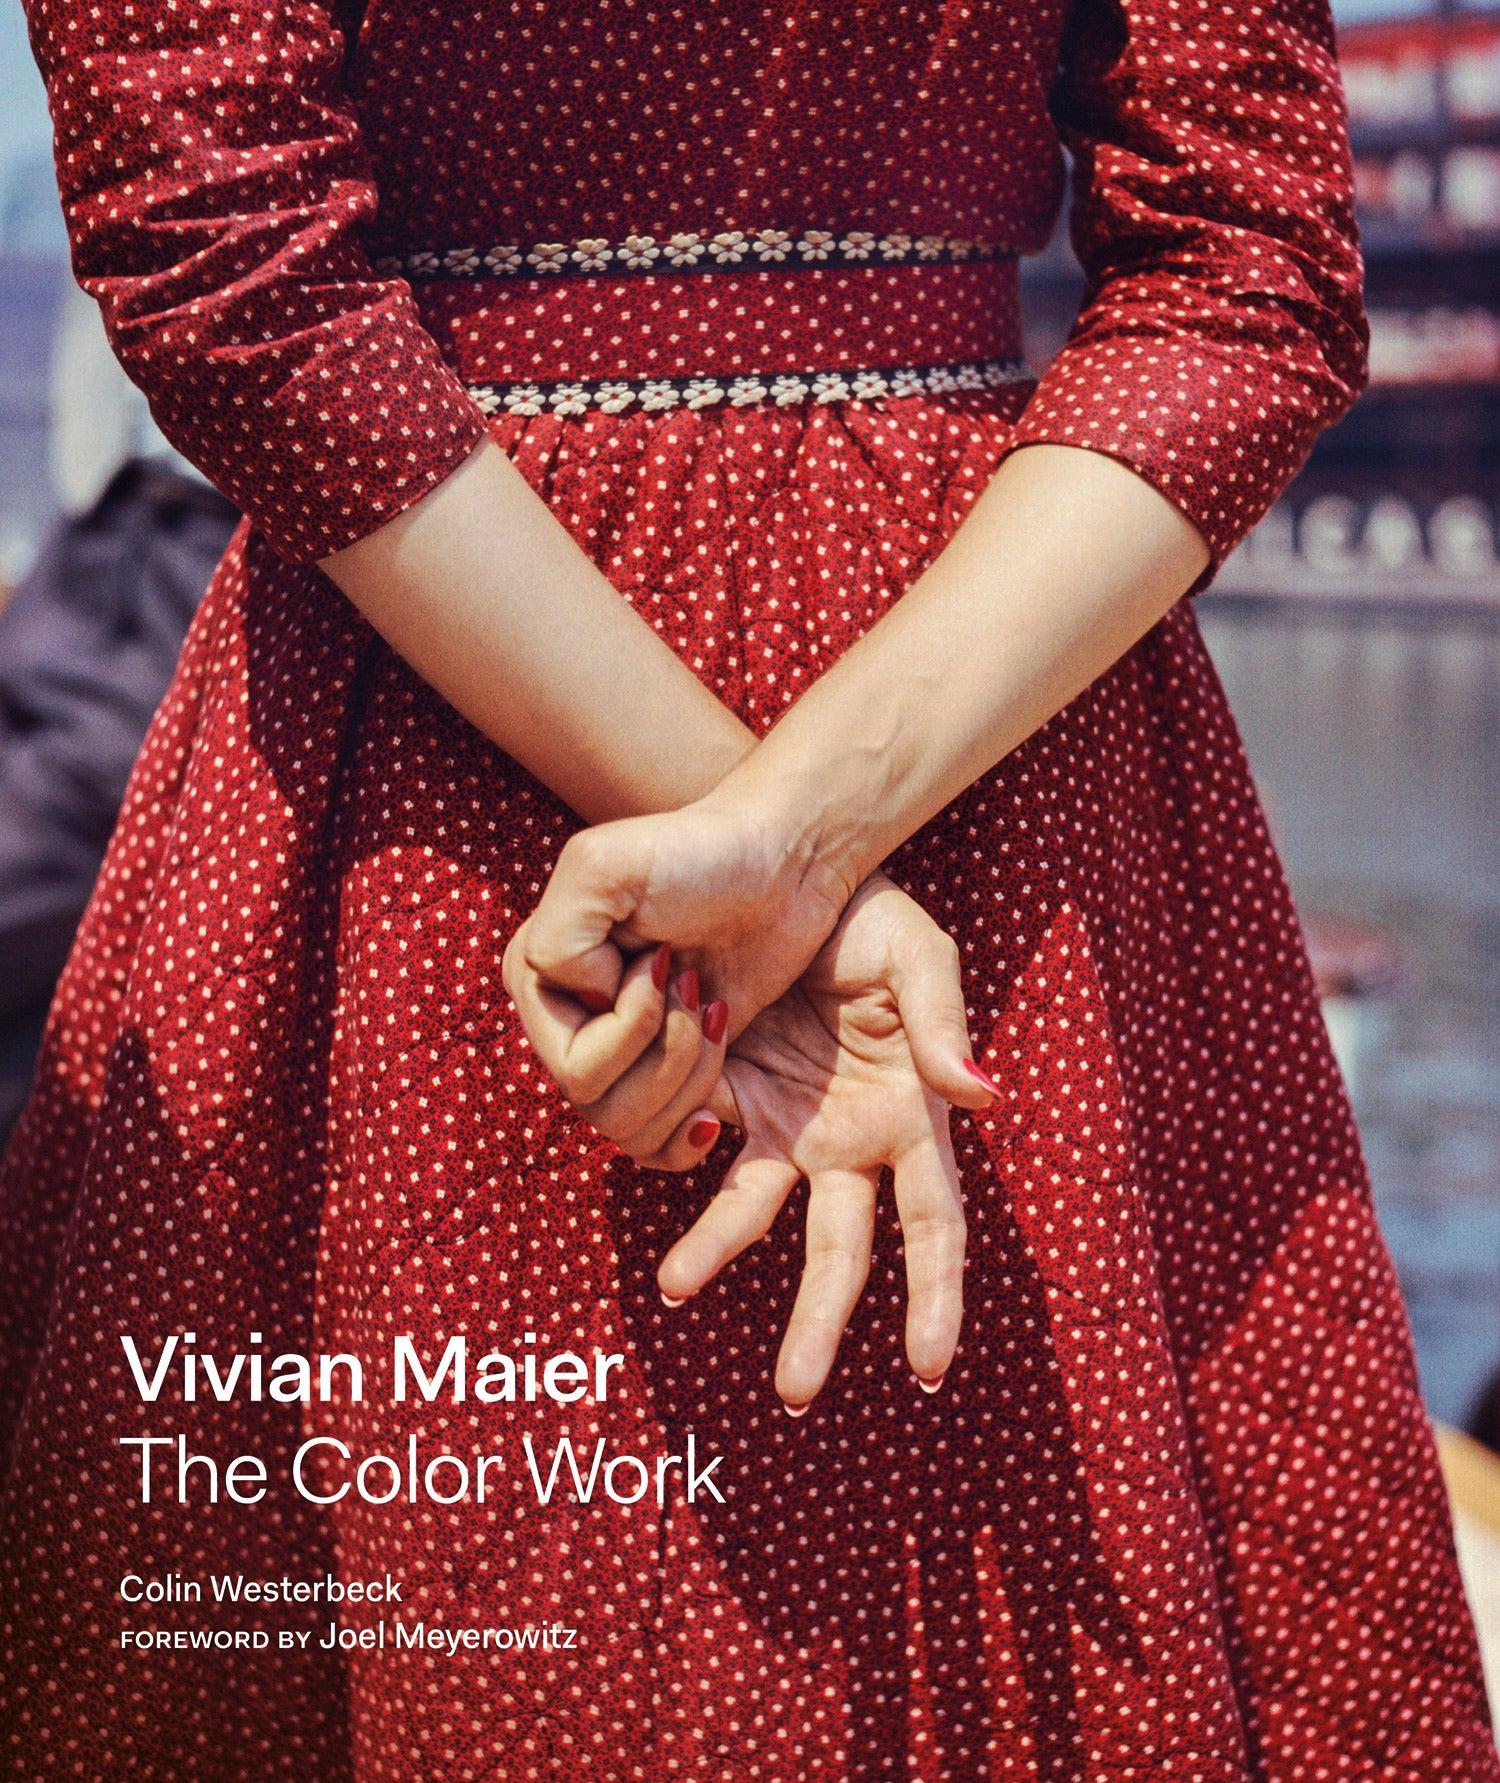 Vivian Maier: The Color Work book cover